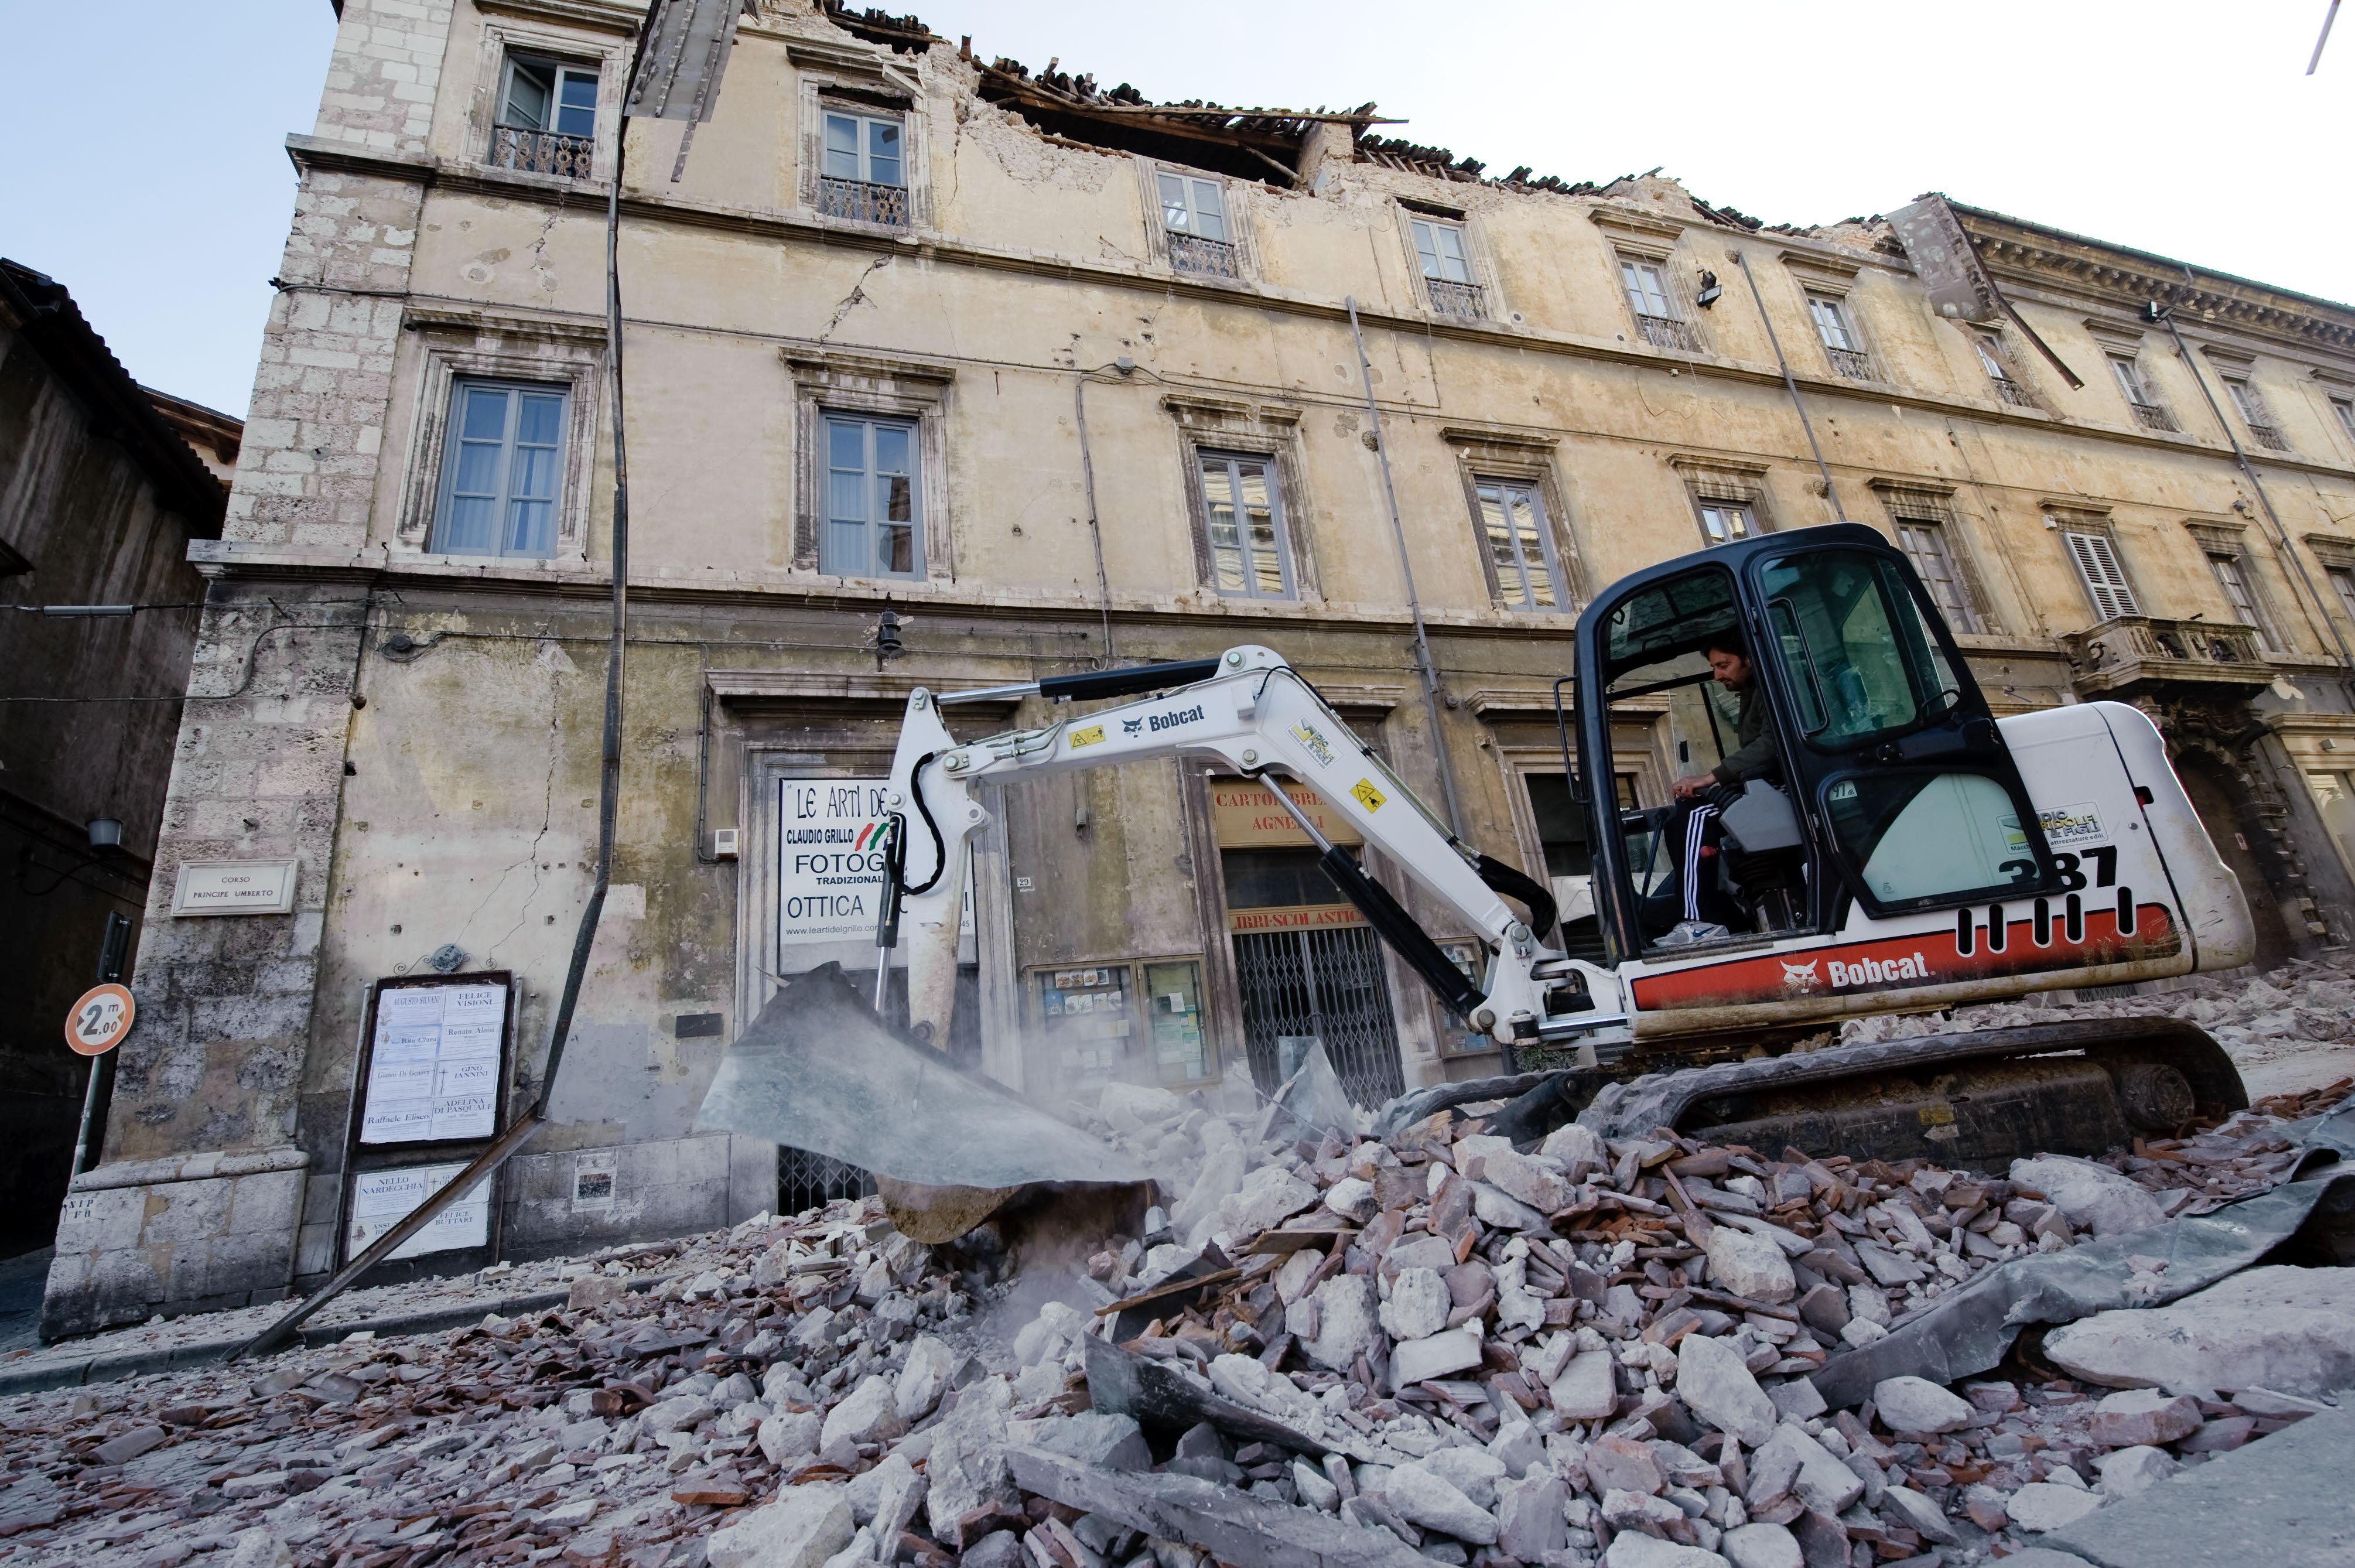 Exista viata dupa cutremur: Cladirile nesigure trebuie puse la pamant!